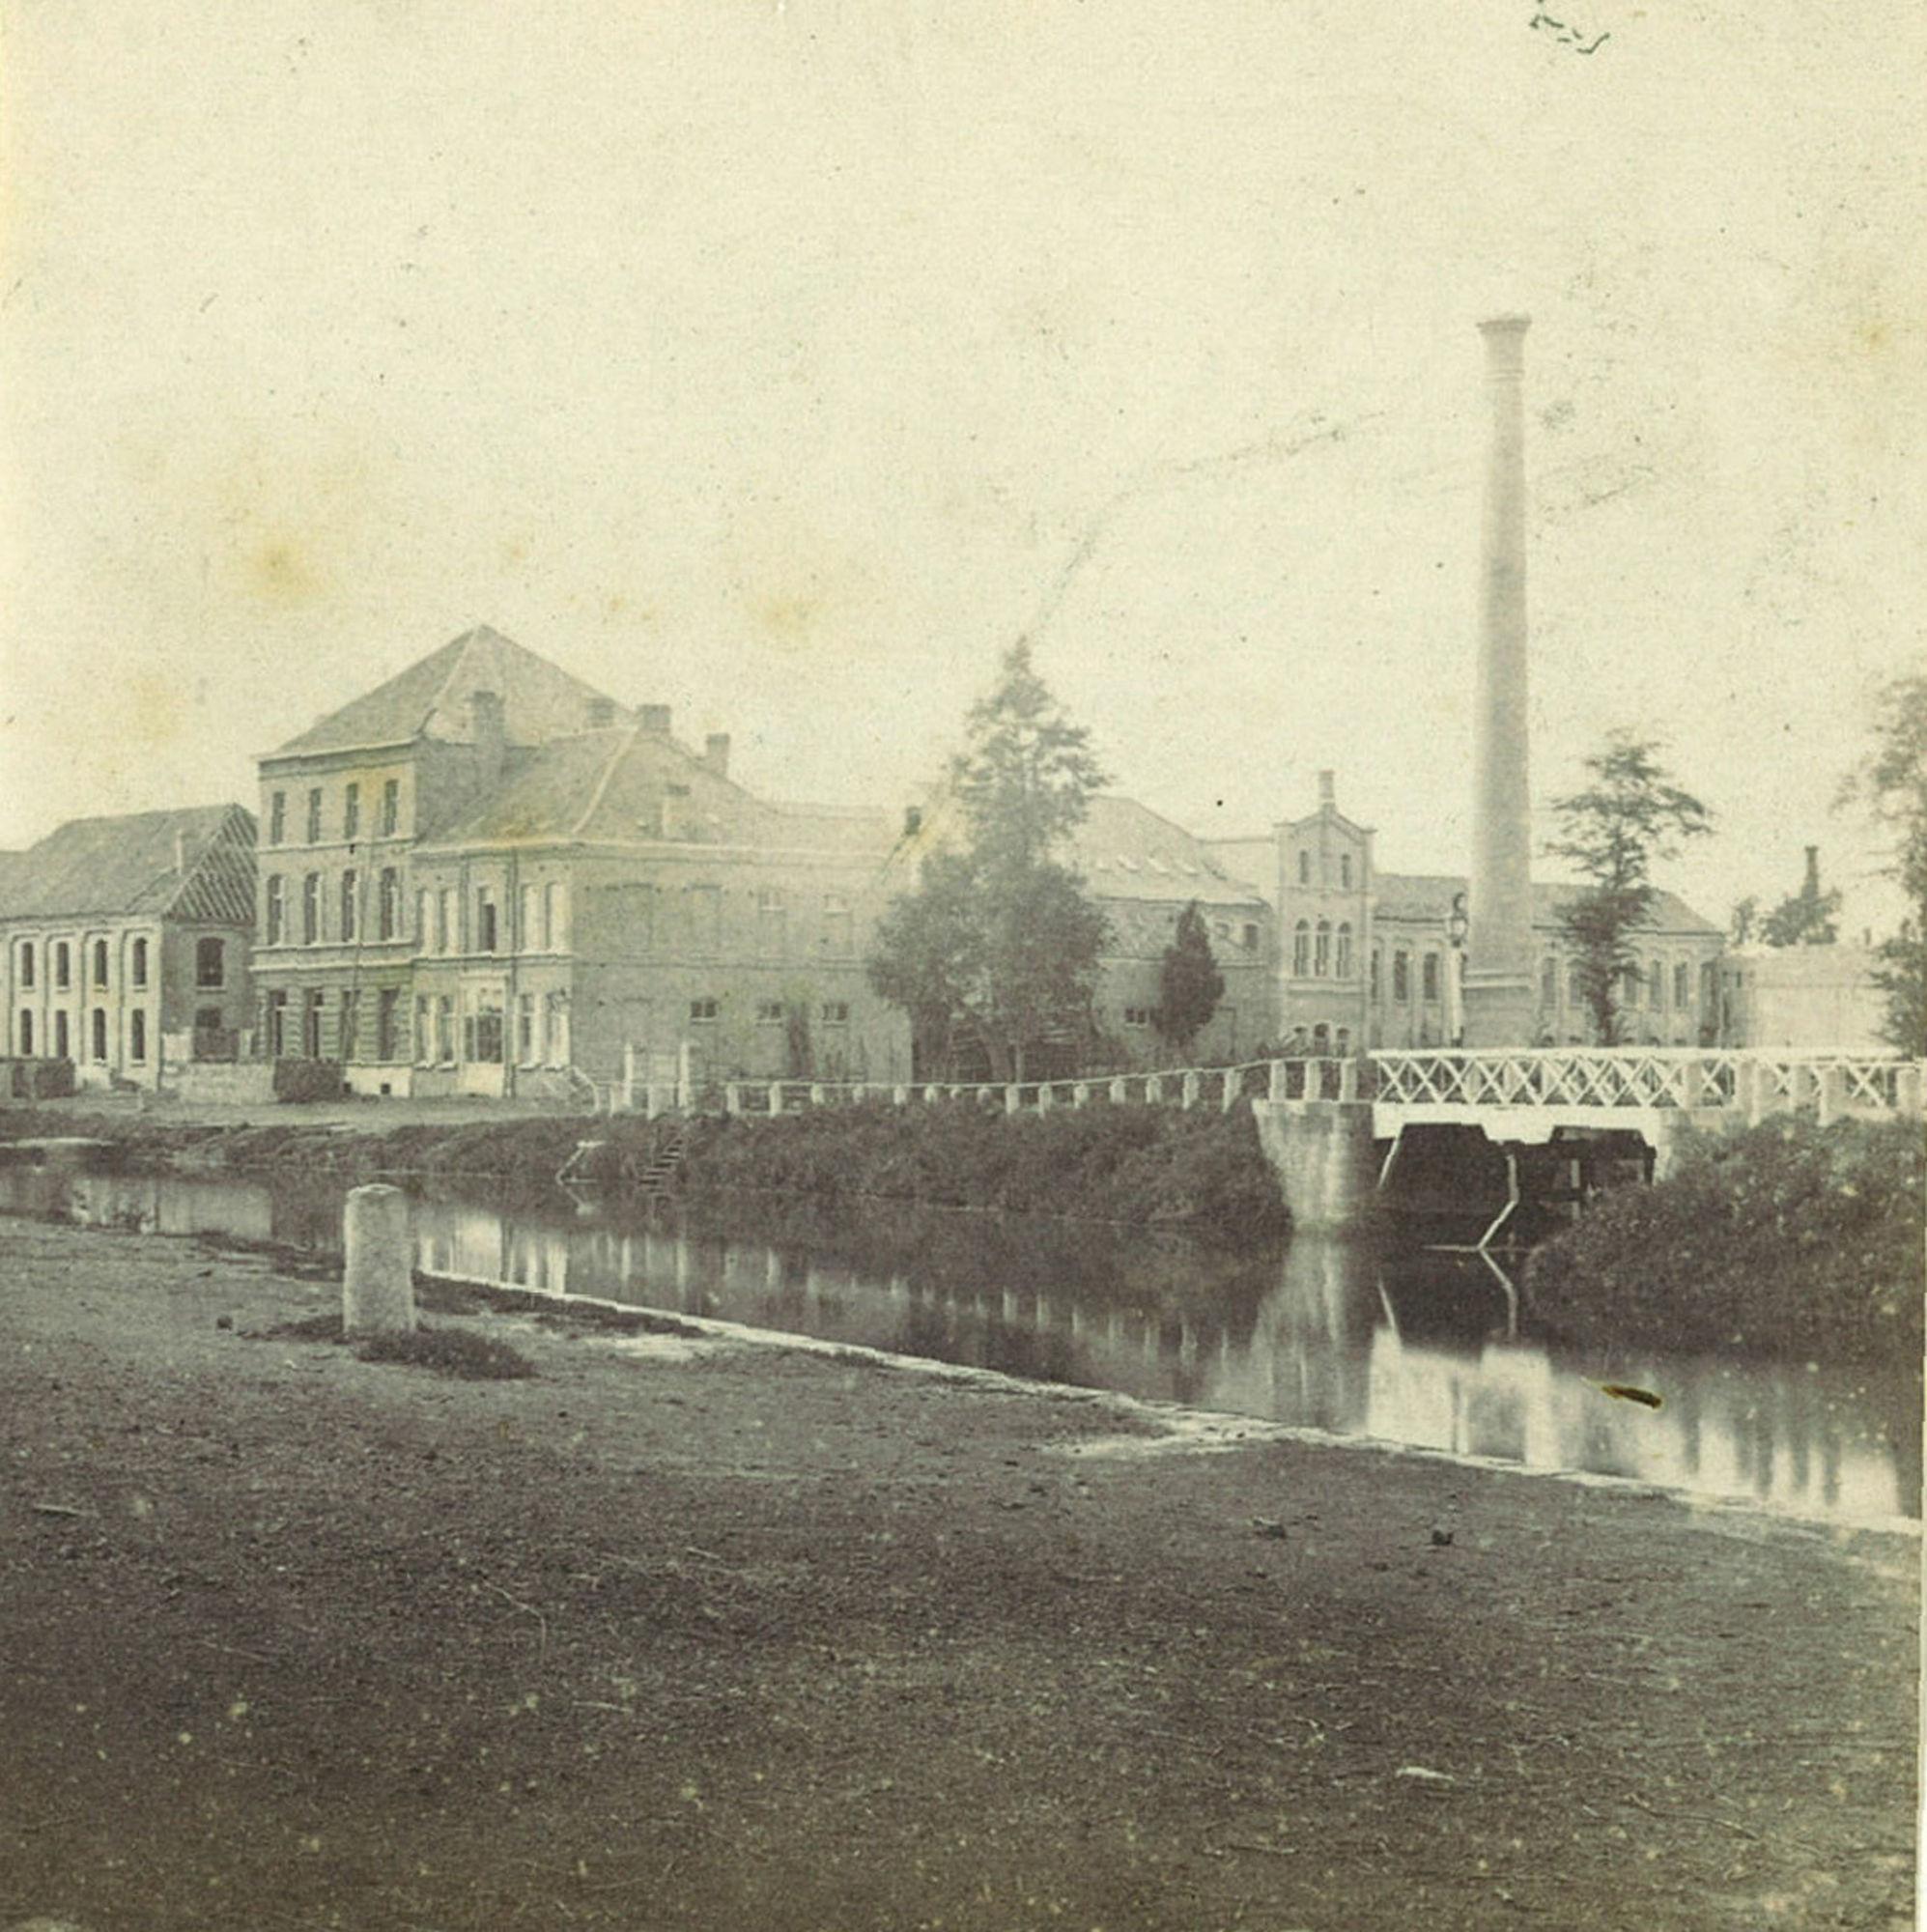 Fabriek van Boutry-Van Ysselstein, later De Kien-Ide